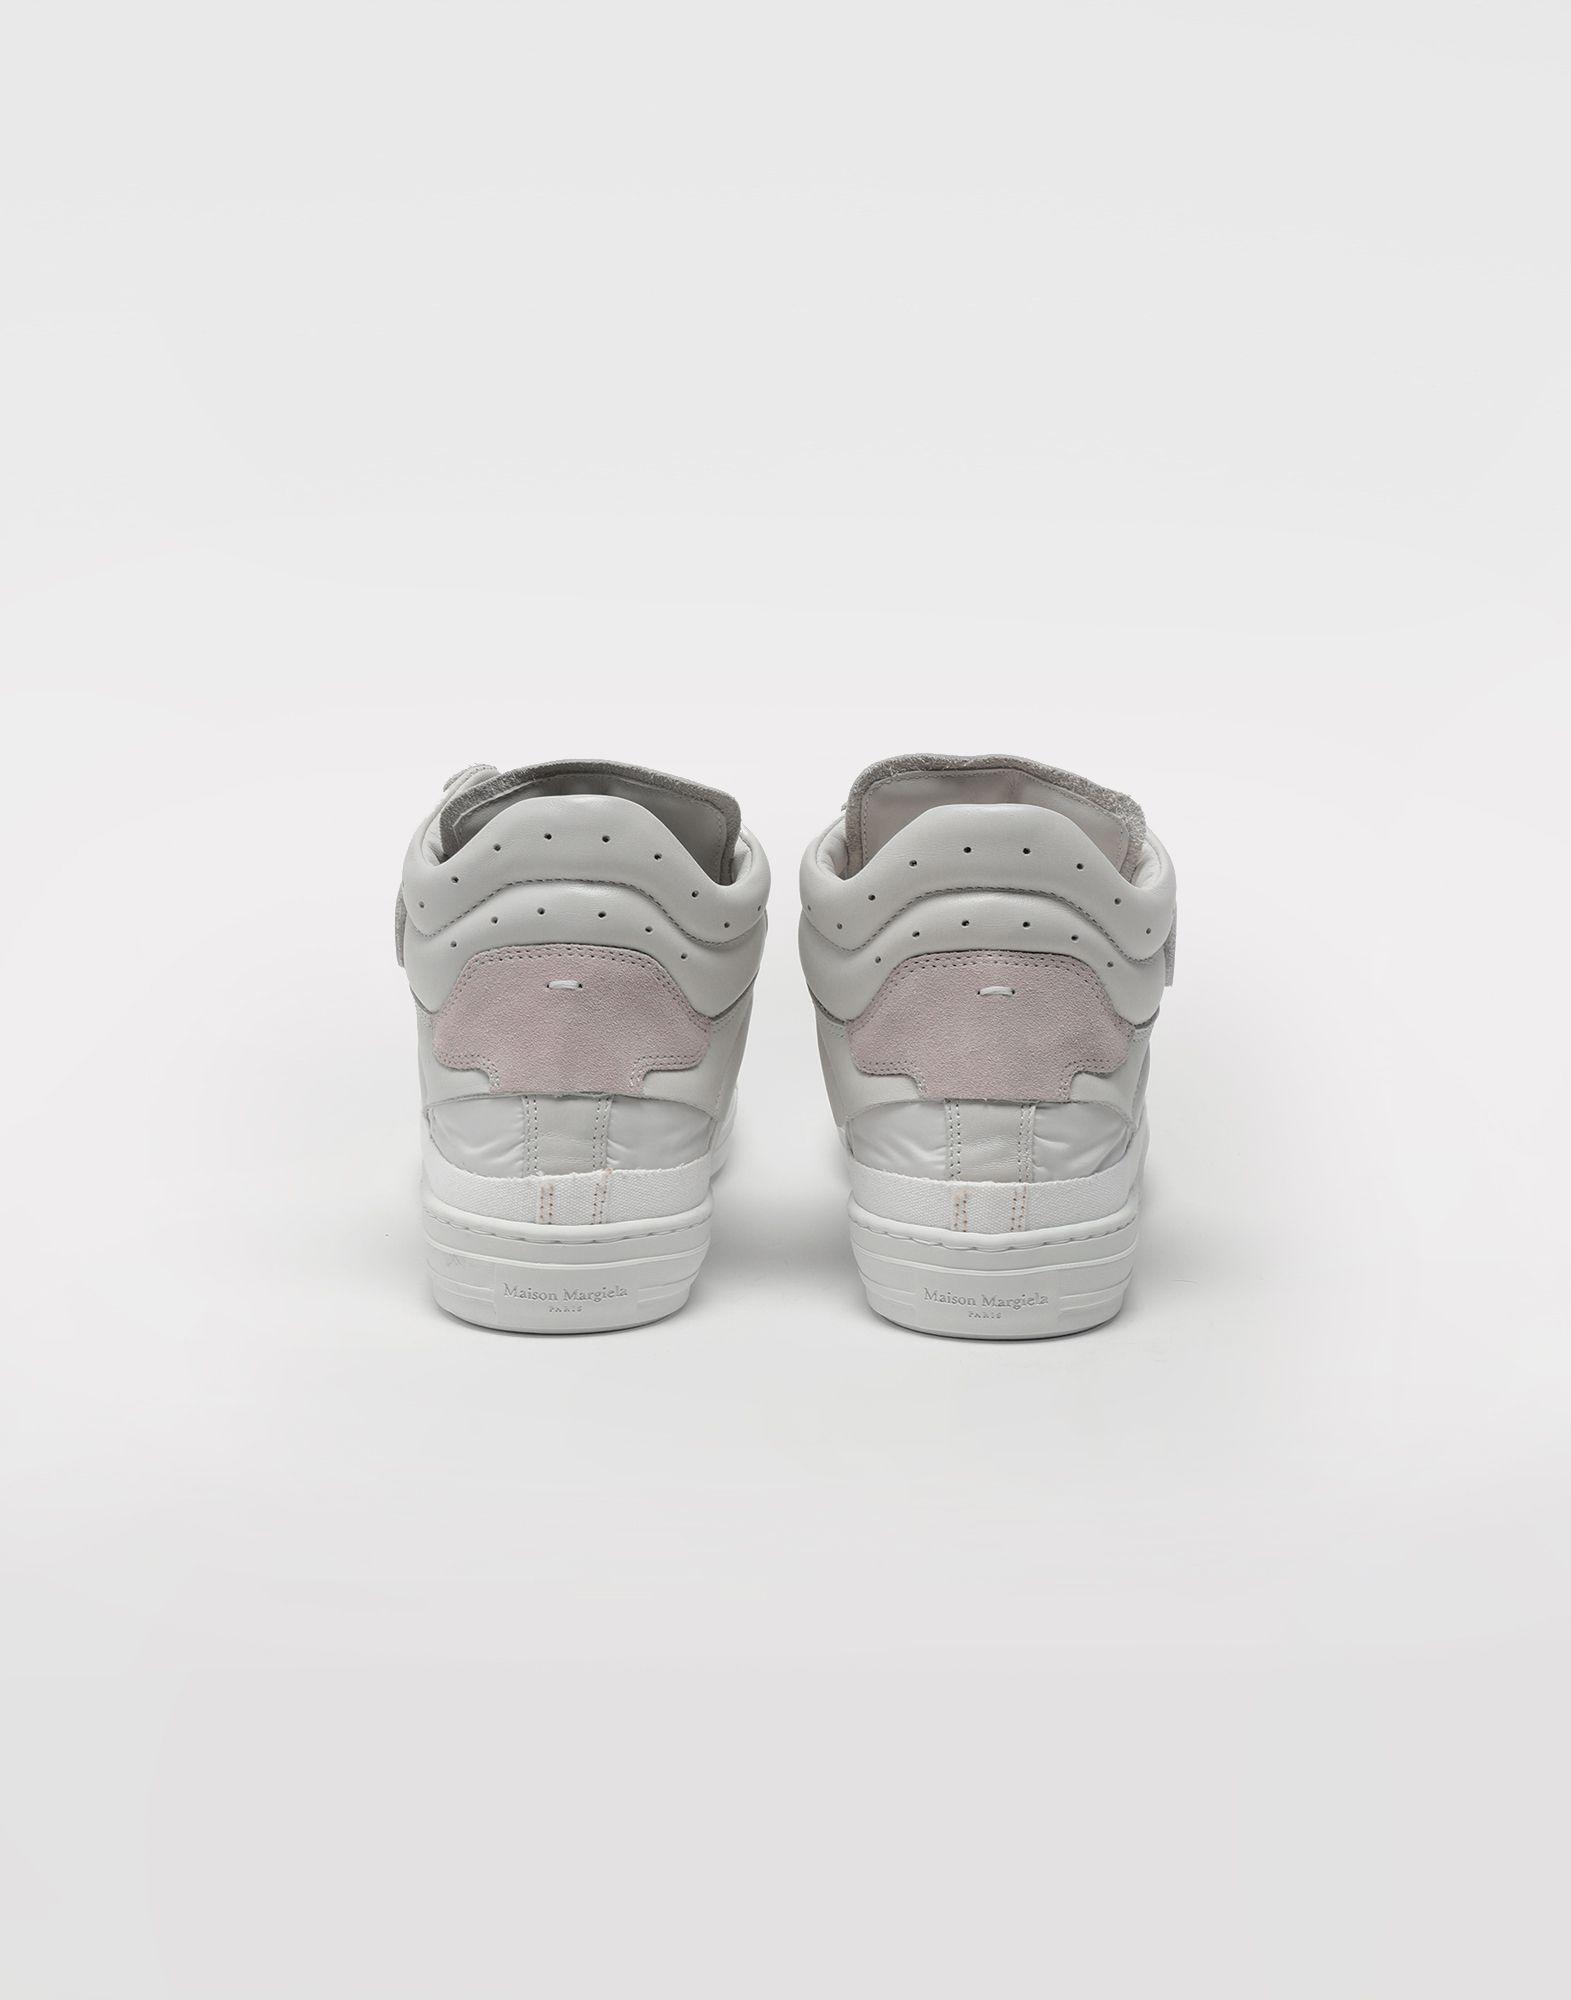 MAISON MARGIELA Sneakers montantes Spliced Sneakers Homme d